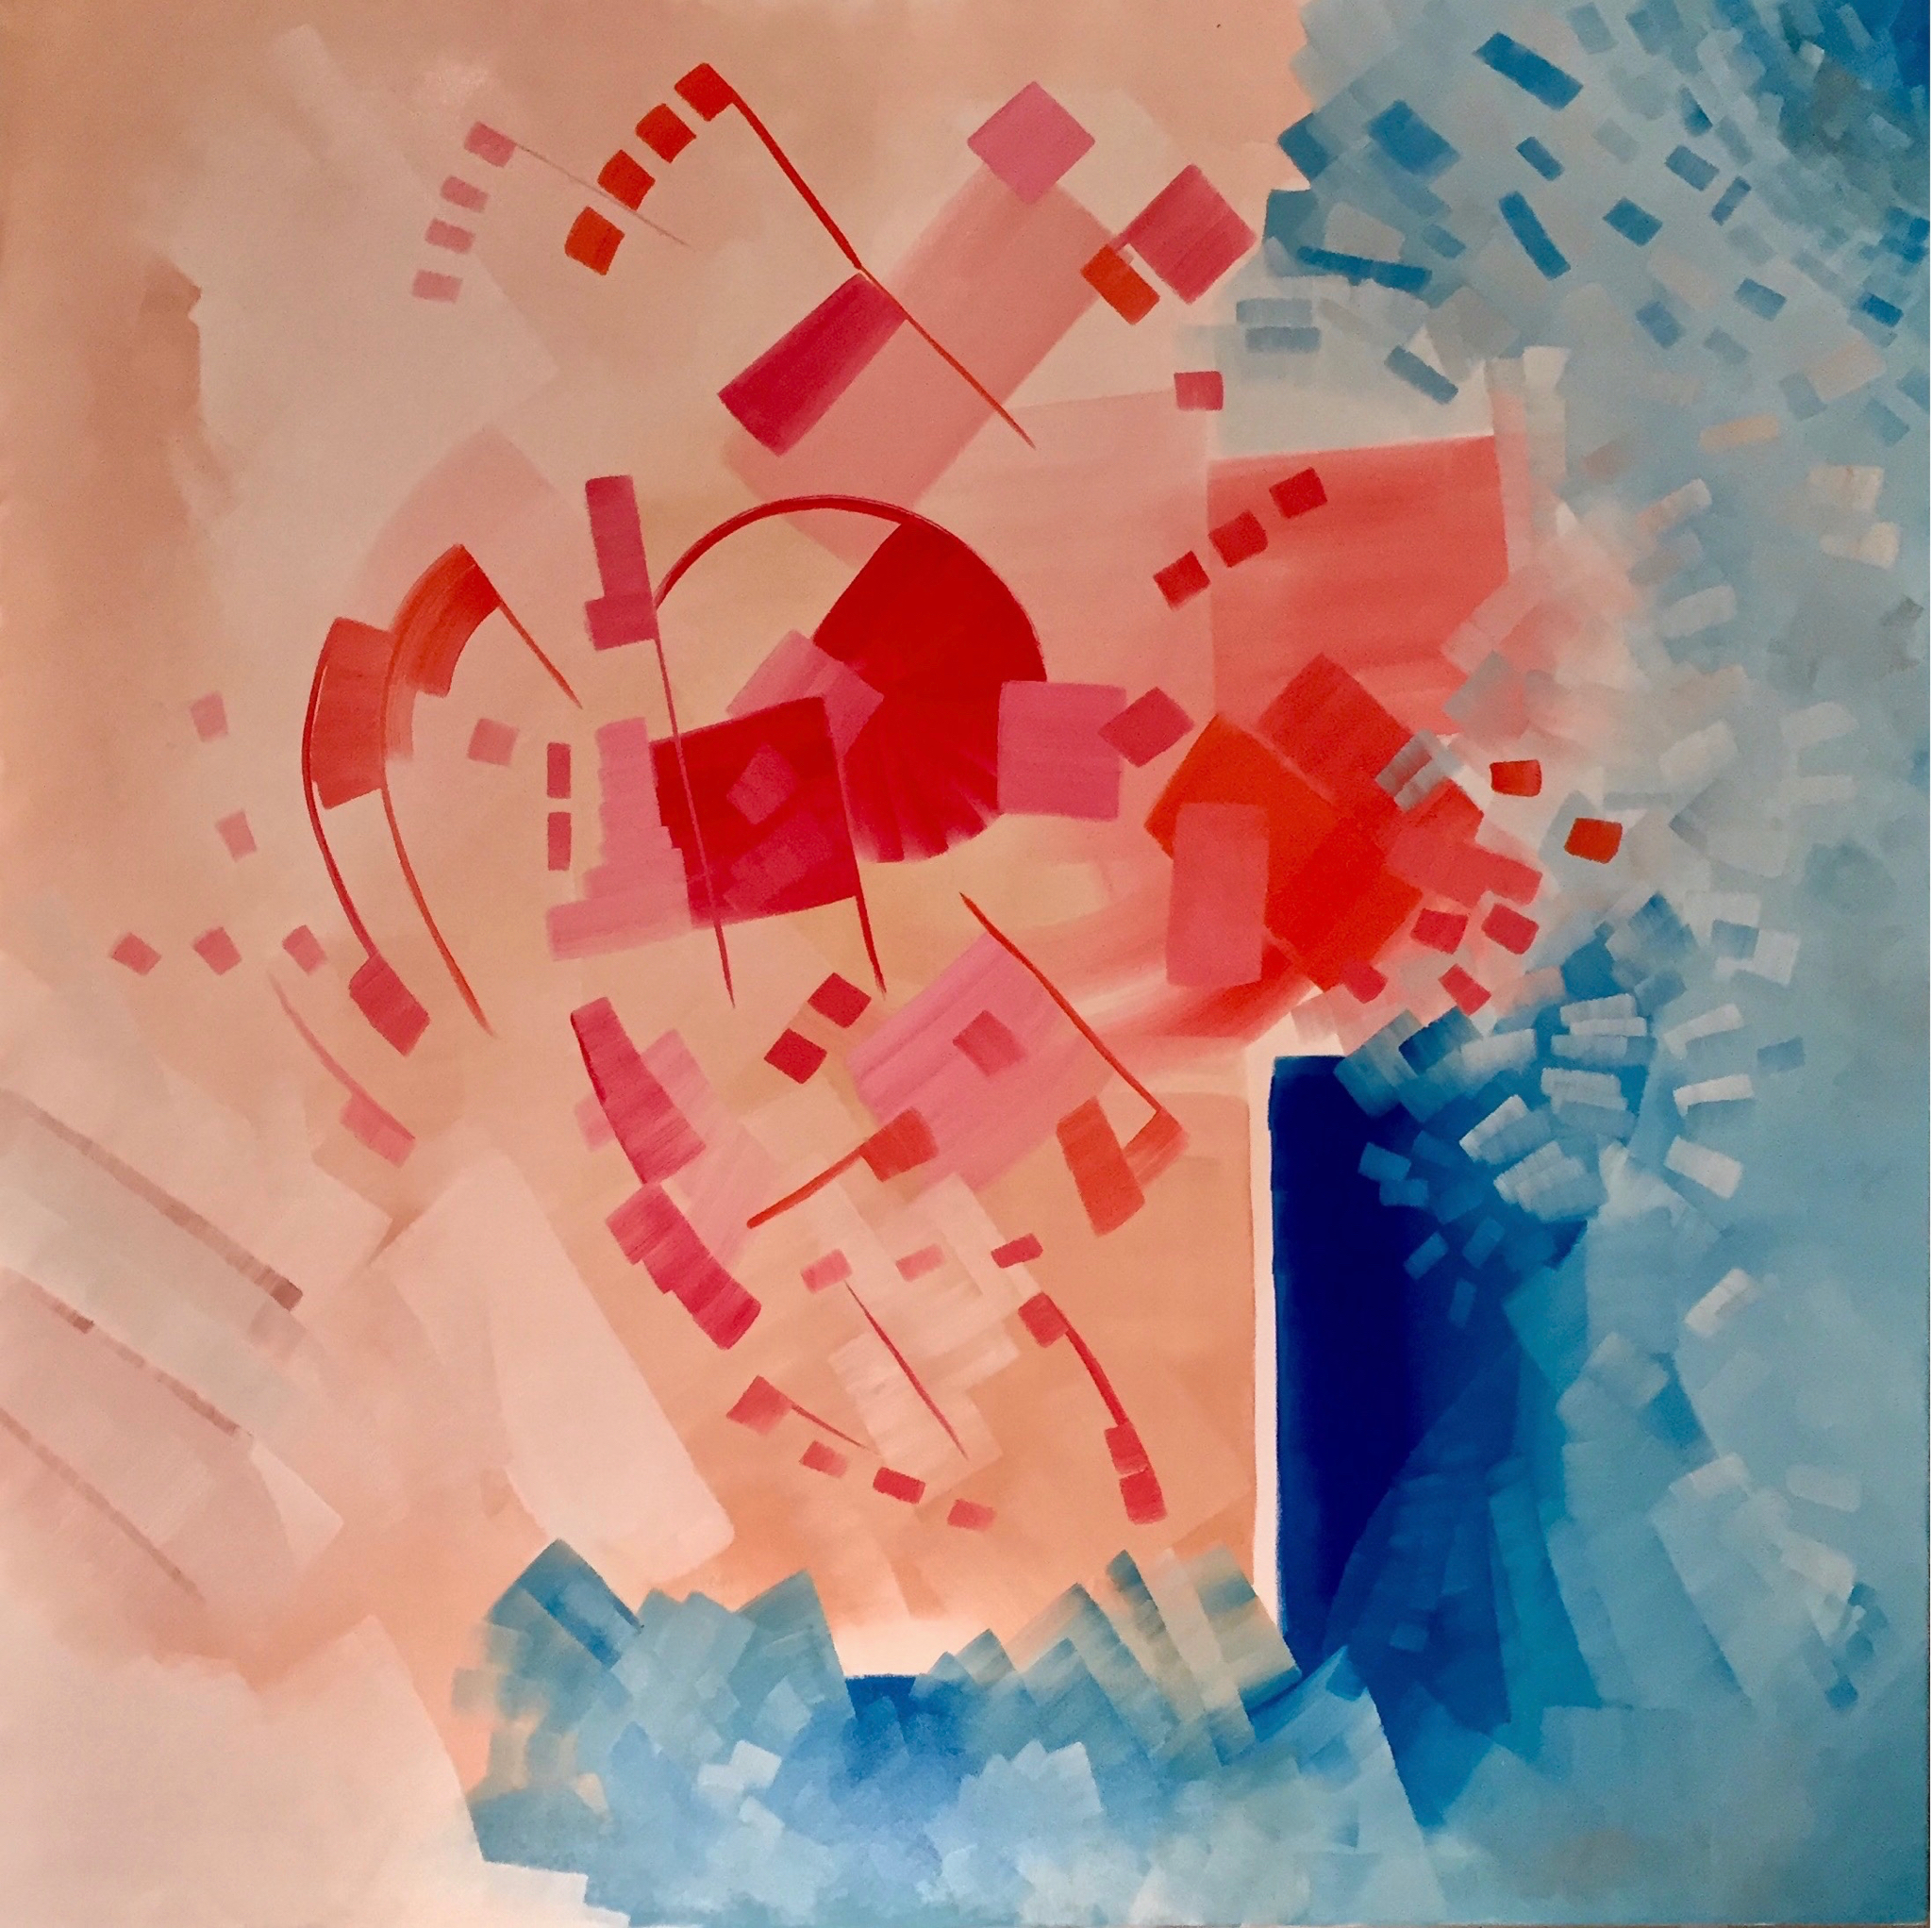 oil on canvas, 200 x 200 cm